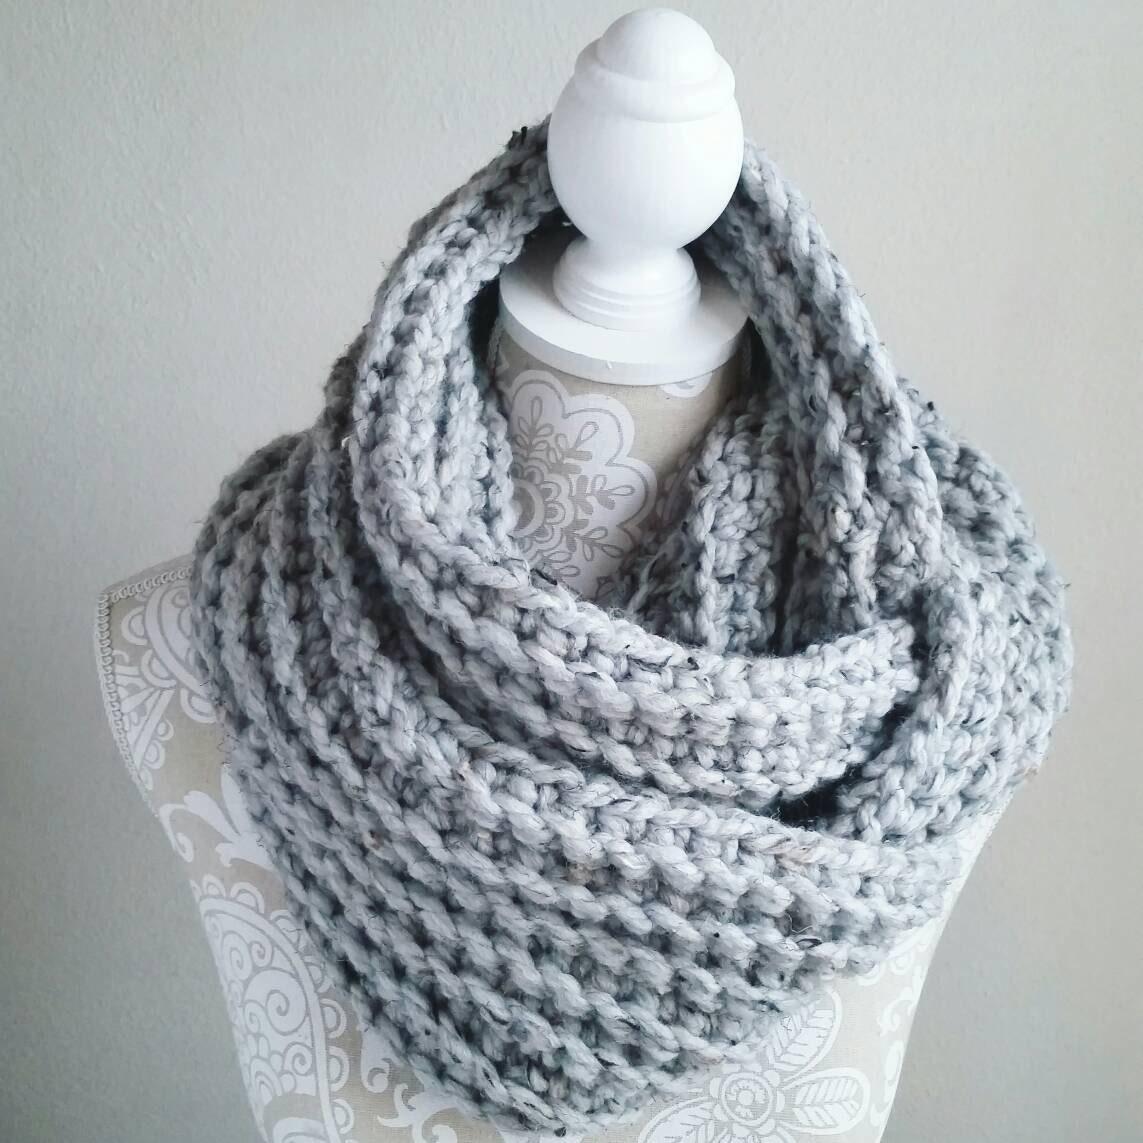 Crochet Infinity Scarf Tutorial For Beginners : Crochet Infinity Scarf PATTERN, Crochet pattern, DIY ...